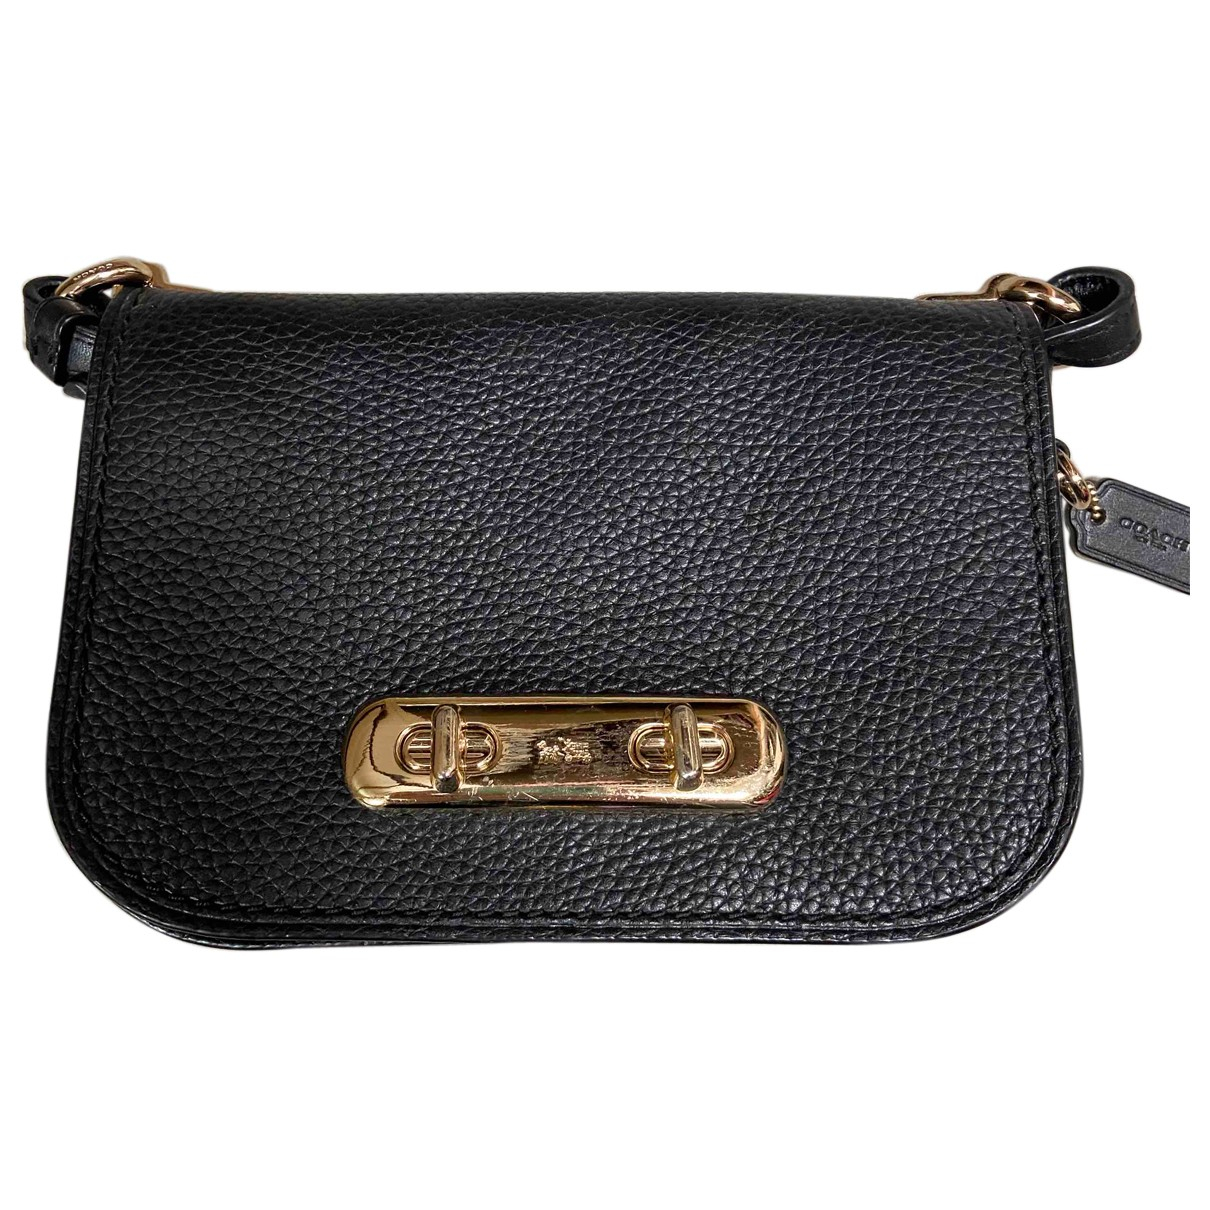 Coach Smooth Crossbody  Black Leather Clutch bag for Women N